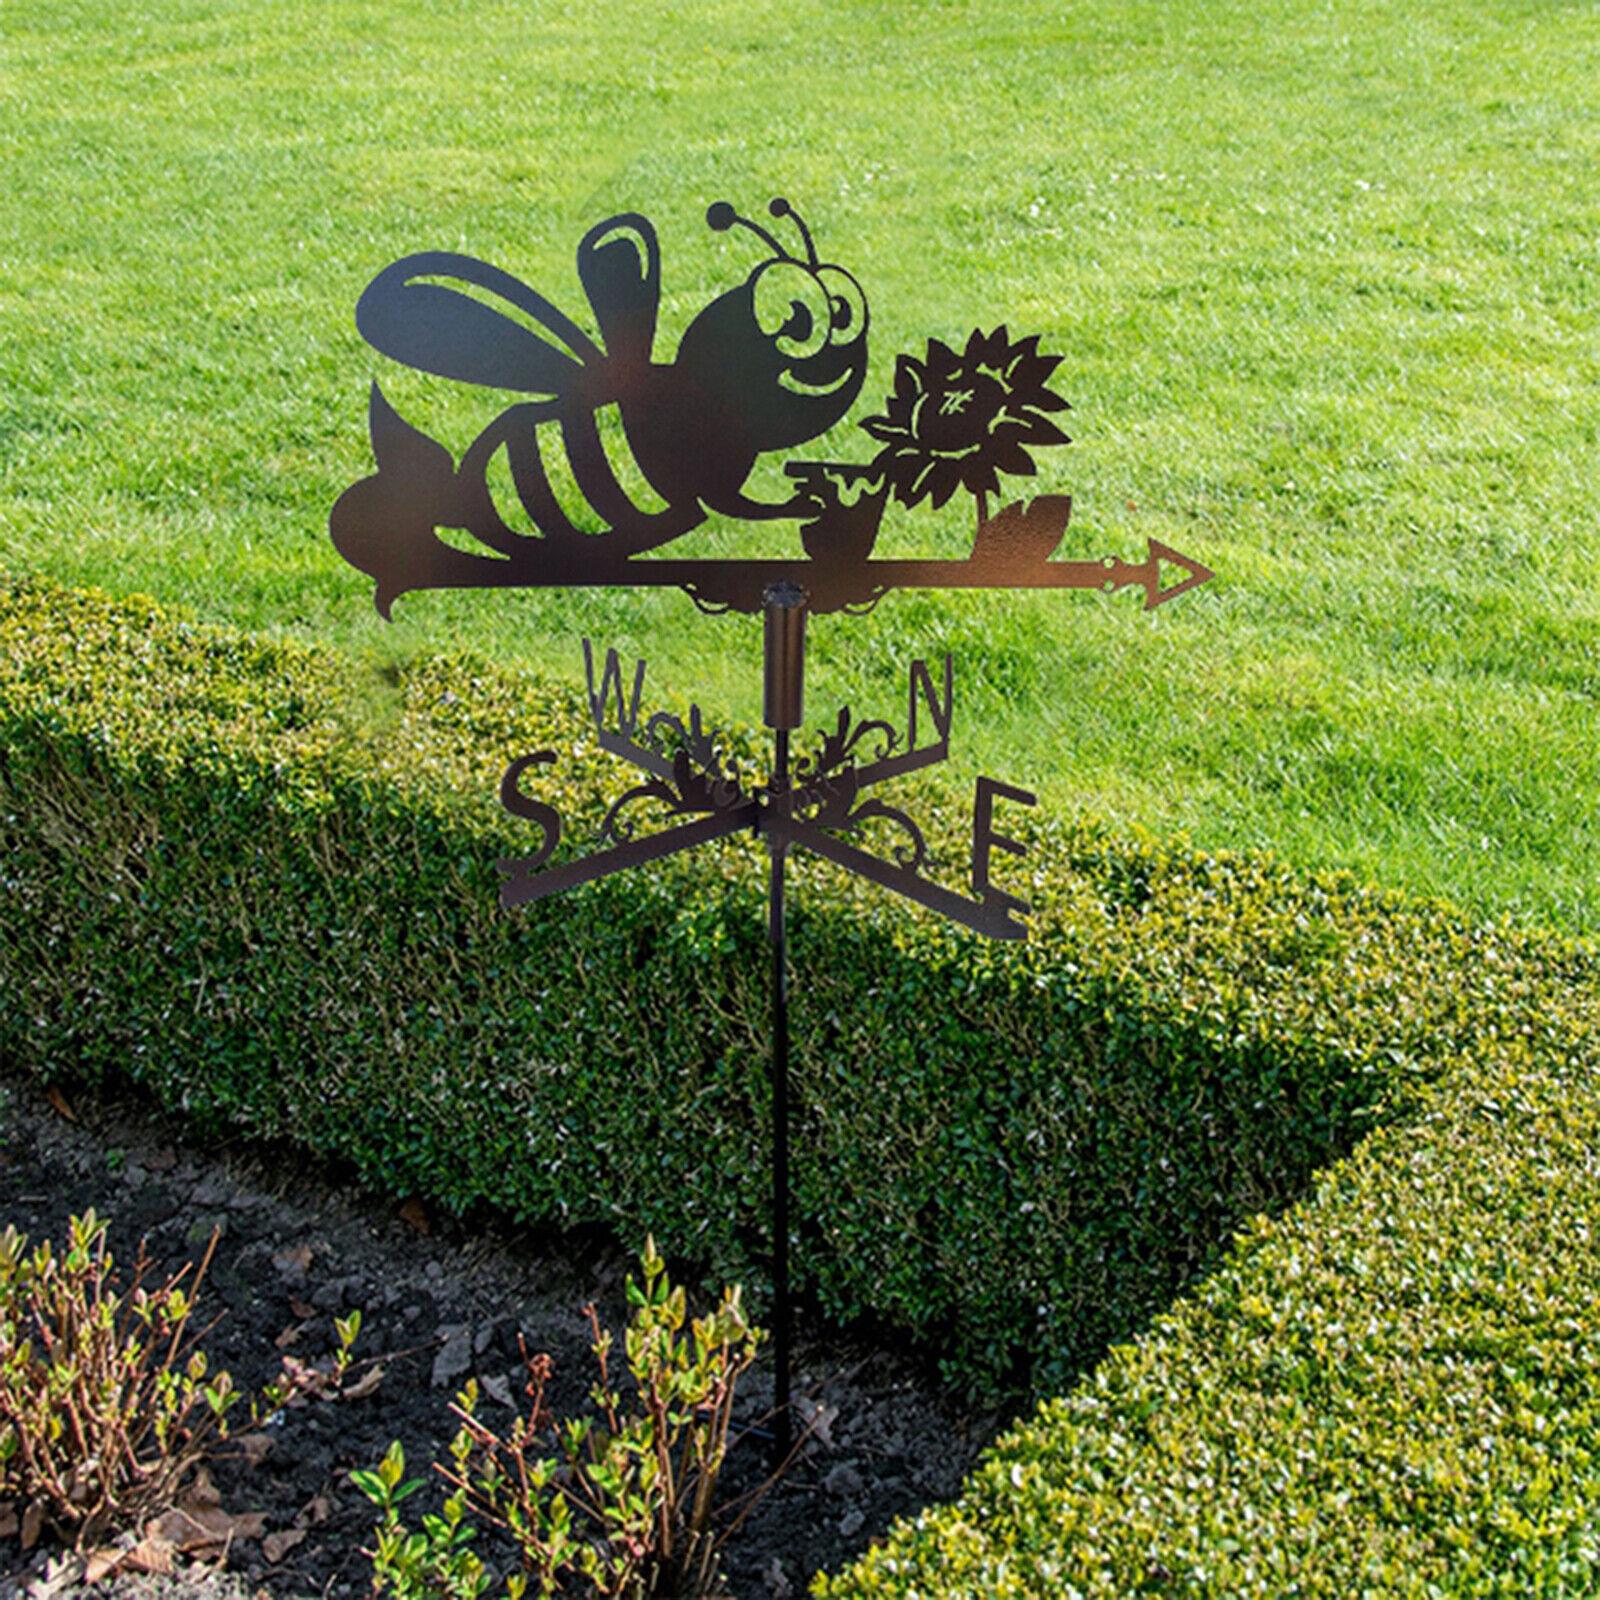 Weather Vane Wind Direction Indicator Kit Weather Vane Garden Decor Bee